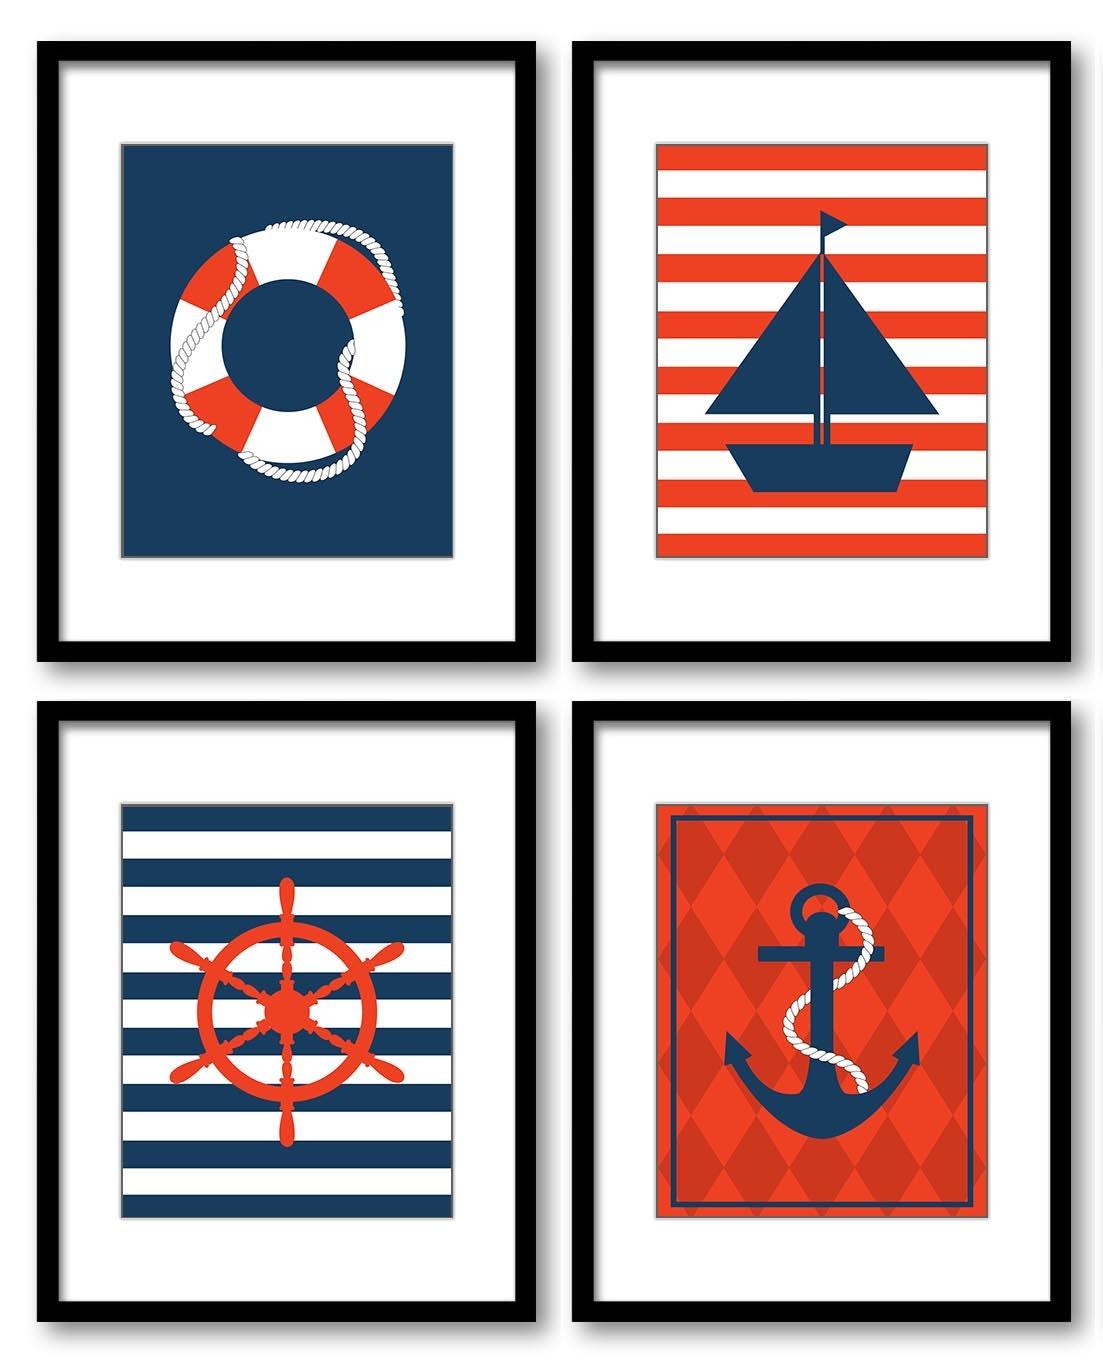 Nautical Nursery Art Set of 4 Prints Red Navy Blue Child Kid Boy Room Wall Decor Sailboat Anchor Cap